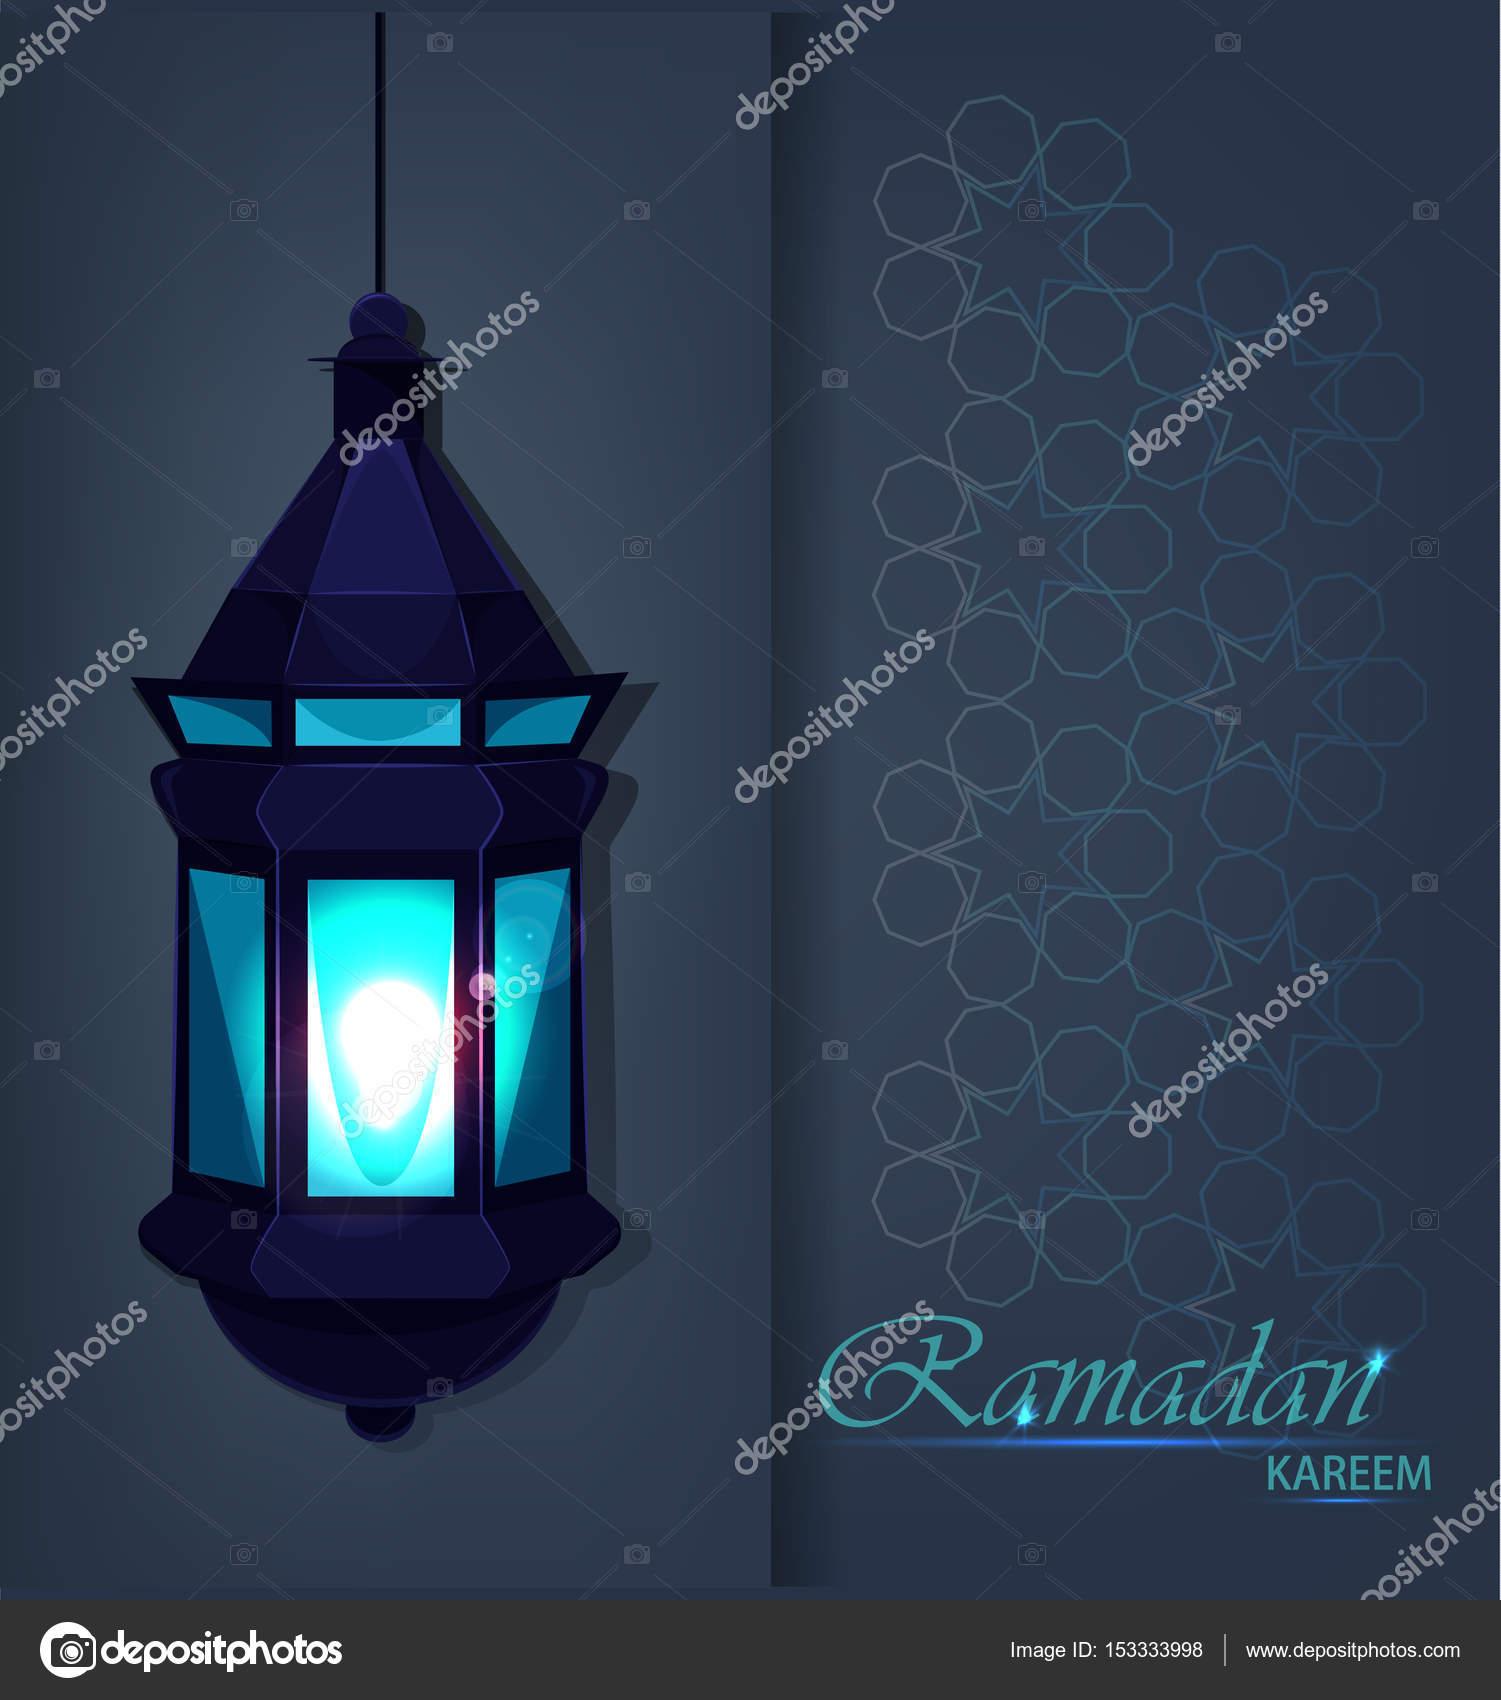 Ramadan kareem beautiful greeting card with traditional arabic ramadan kareem beautiful greeting card with traditional arabic lantern on blue background muslim traditional holiday m4hsunfo